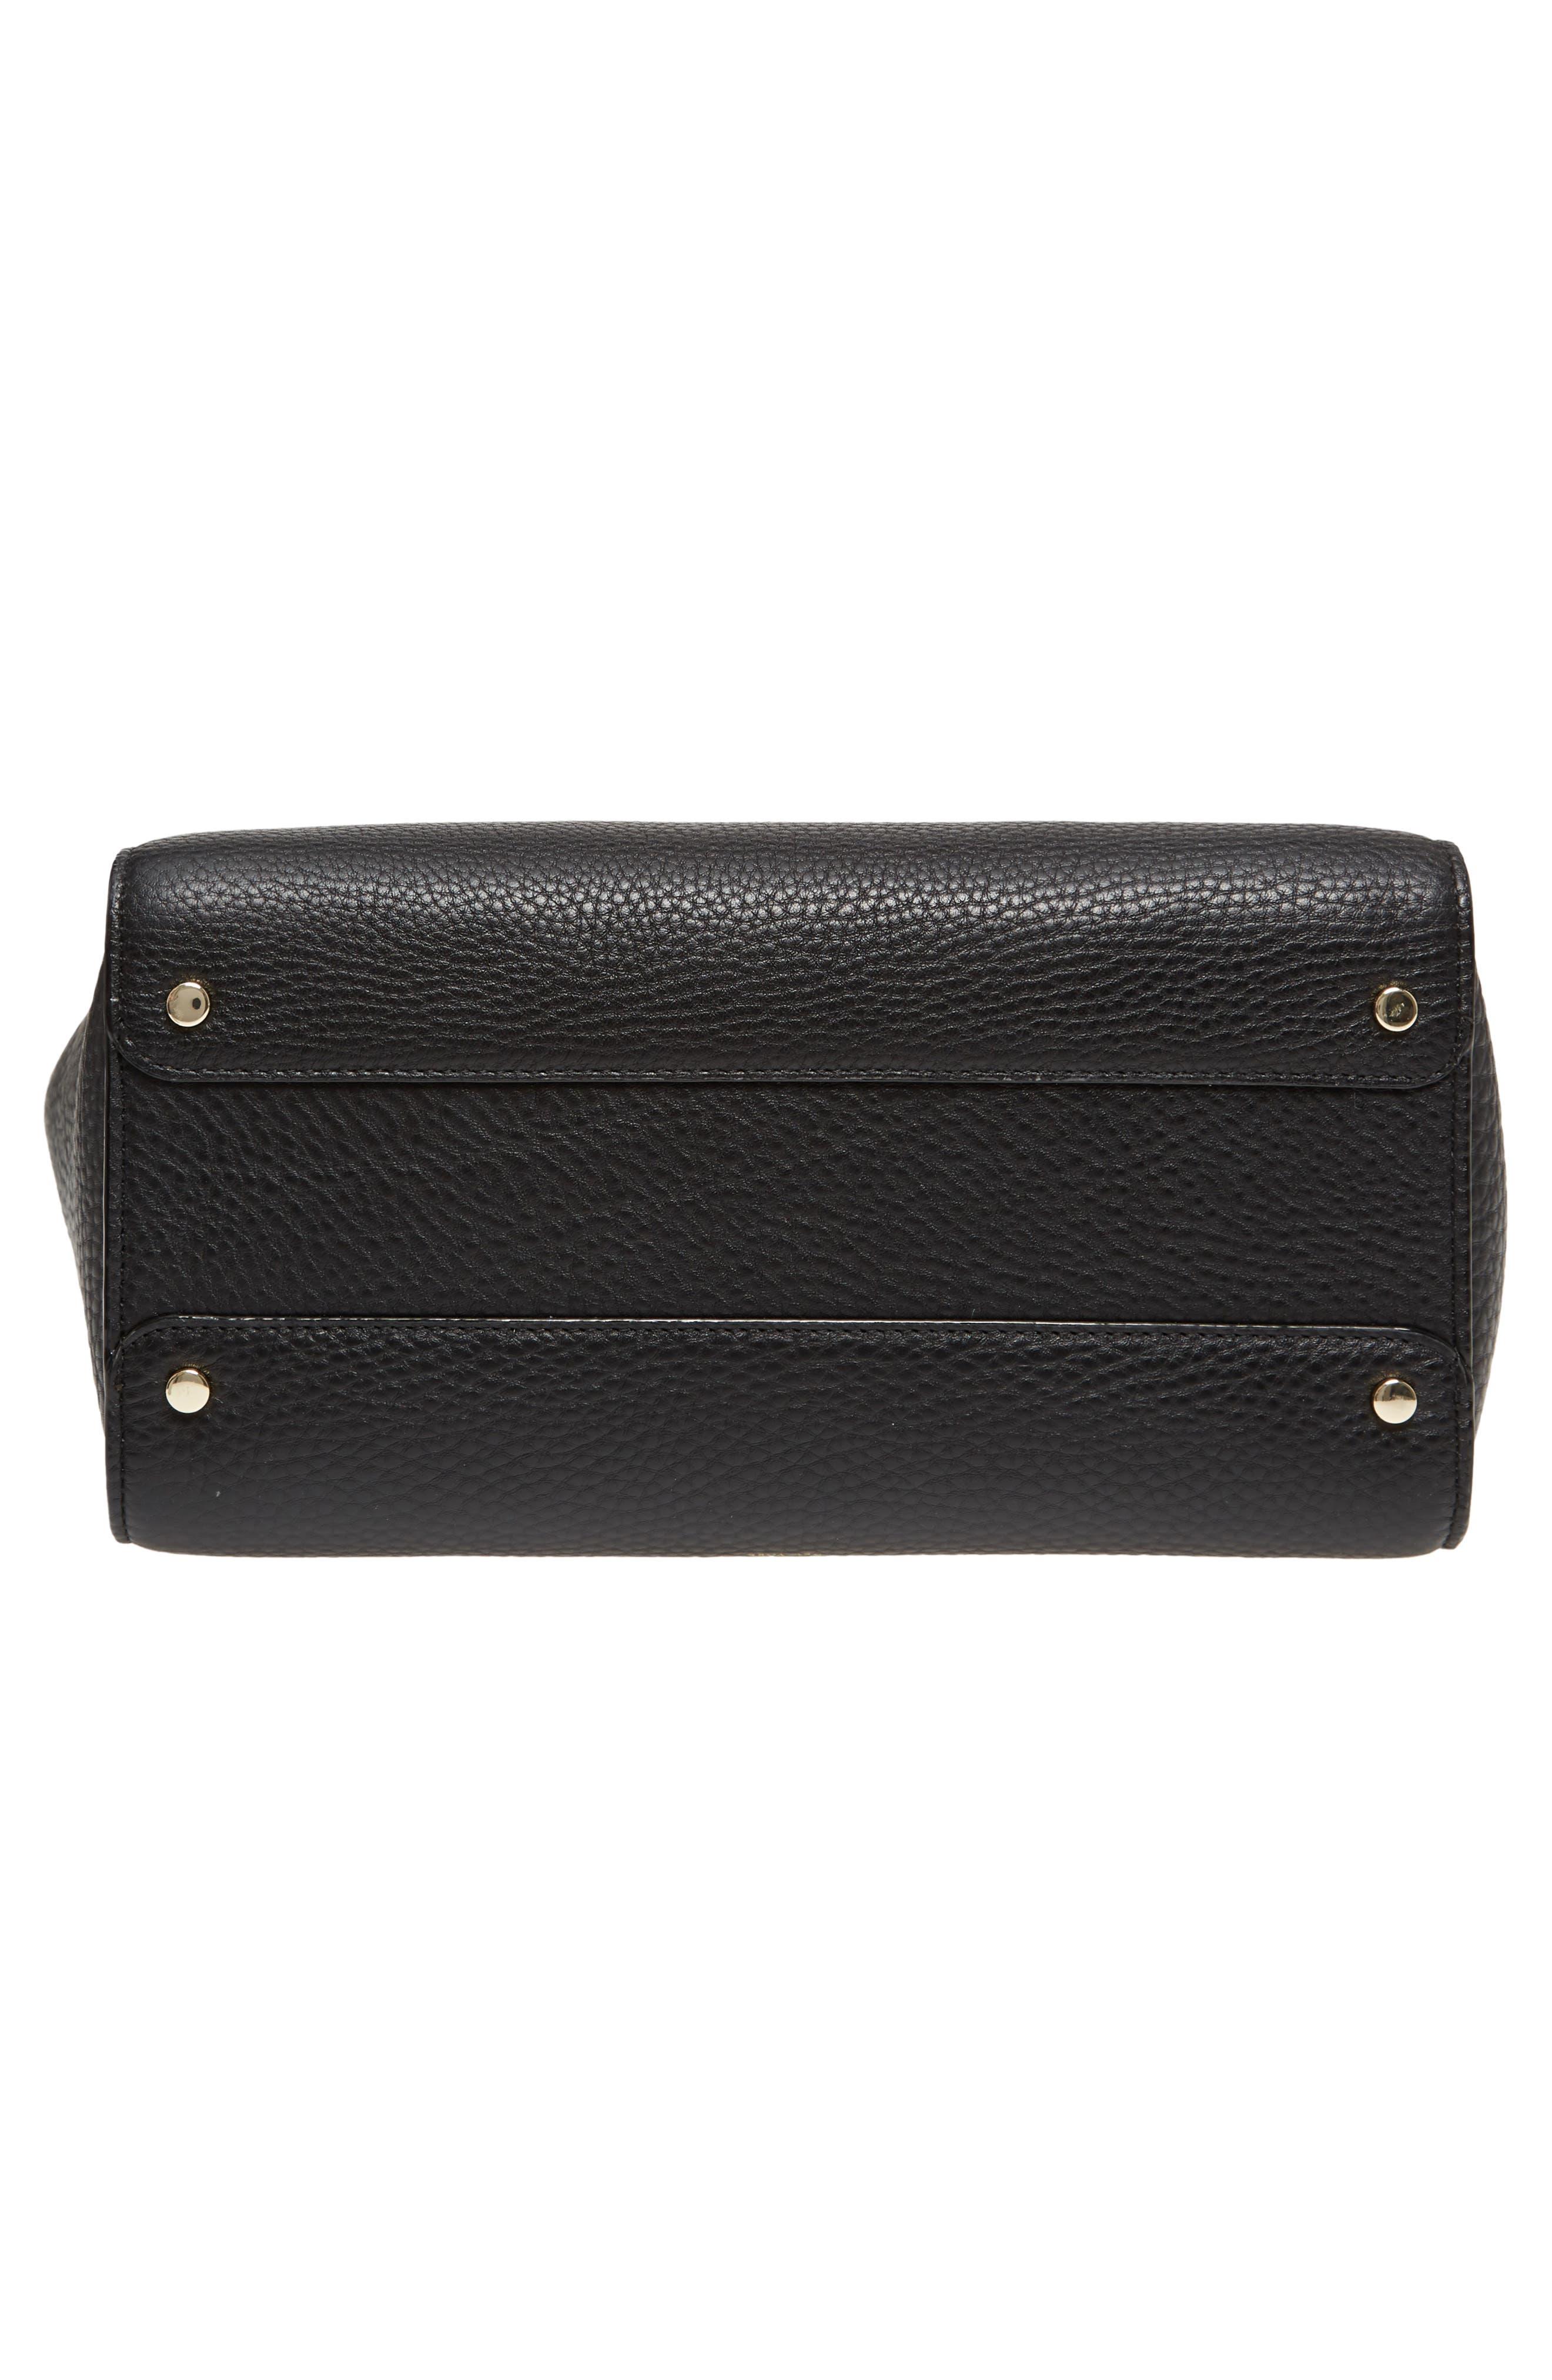 carlyle street - alexa leather satchel,                             Alternate thumbnail 11, color,